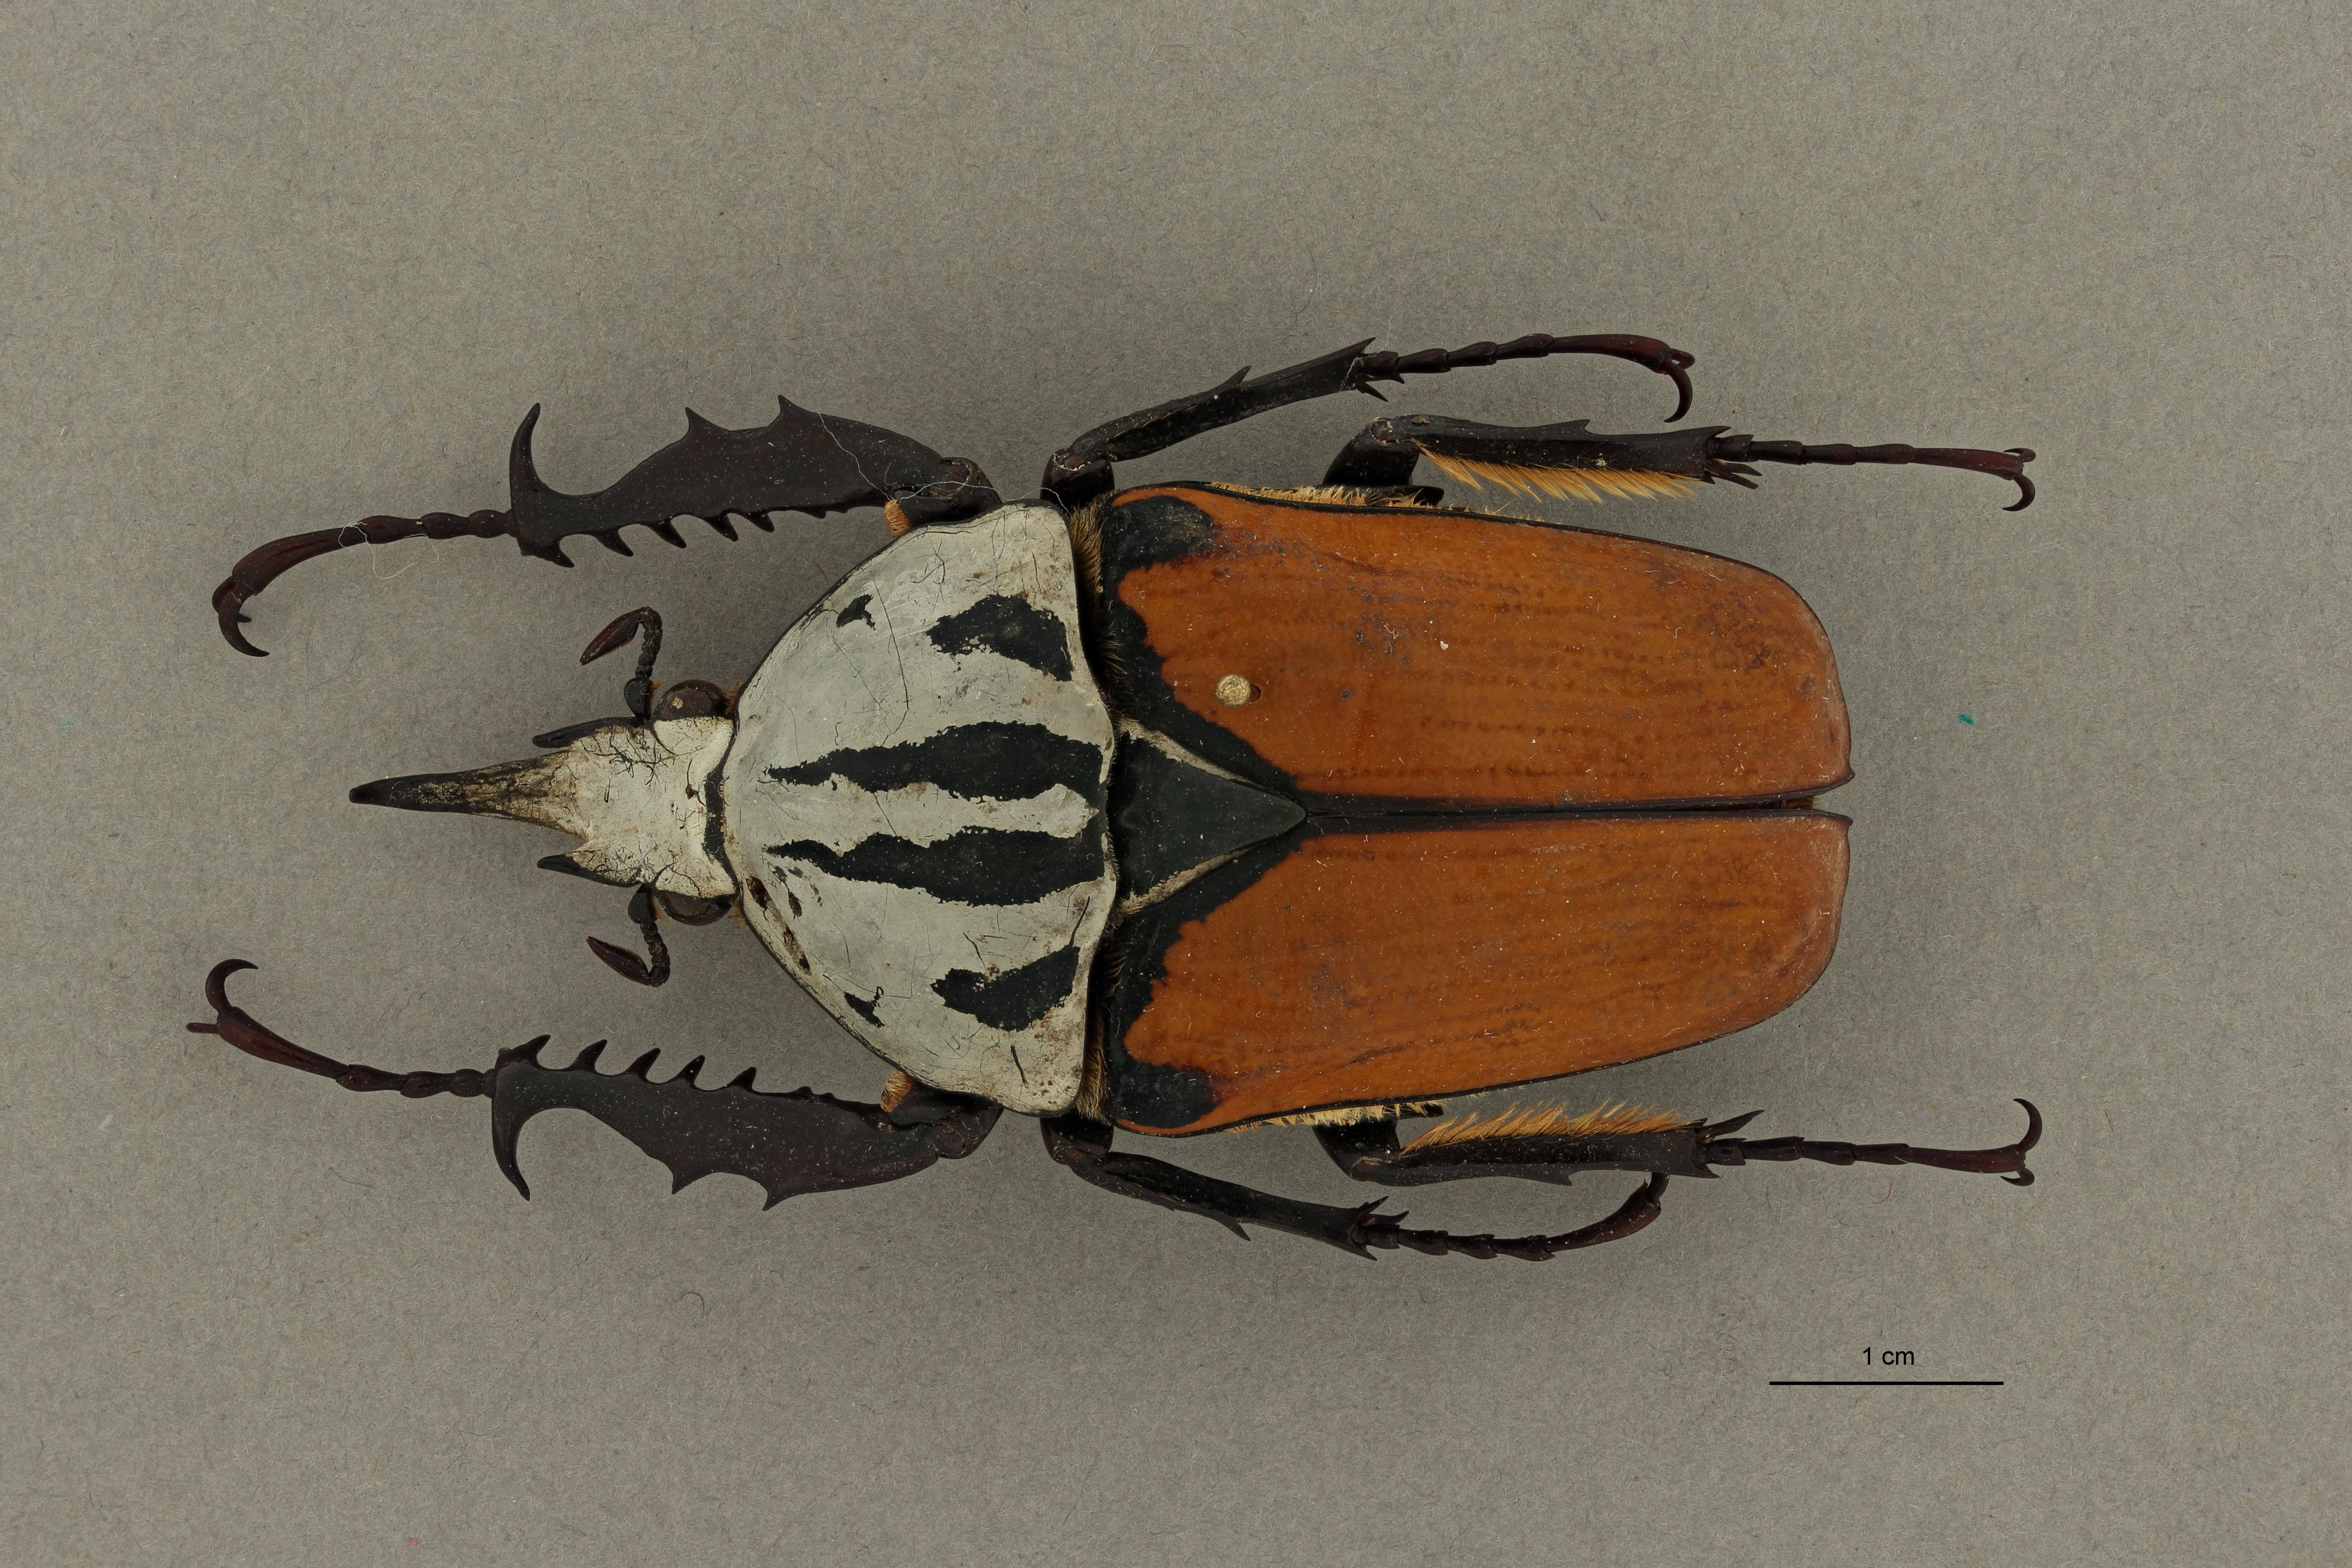 Mecynorrhinella oberthuri kirchneri pt 2 D ZS PMax Scaled.jpeg